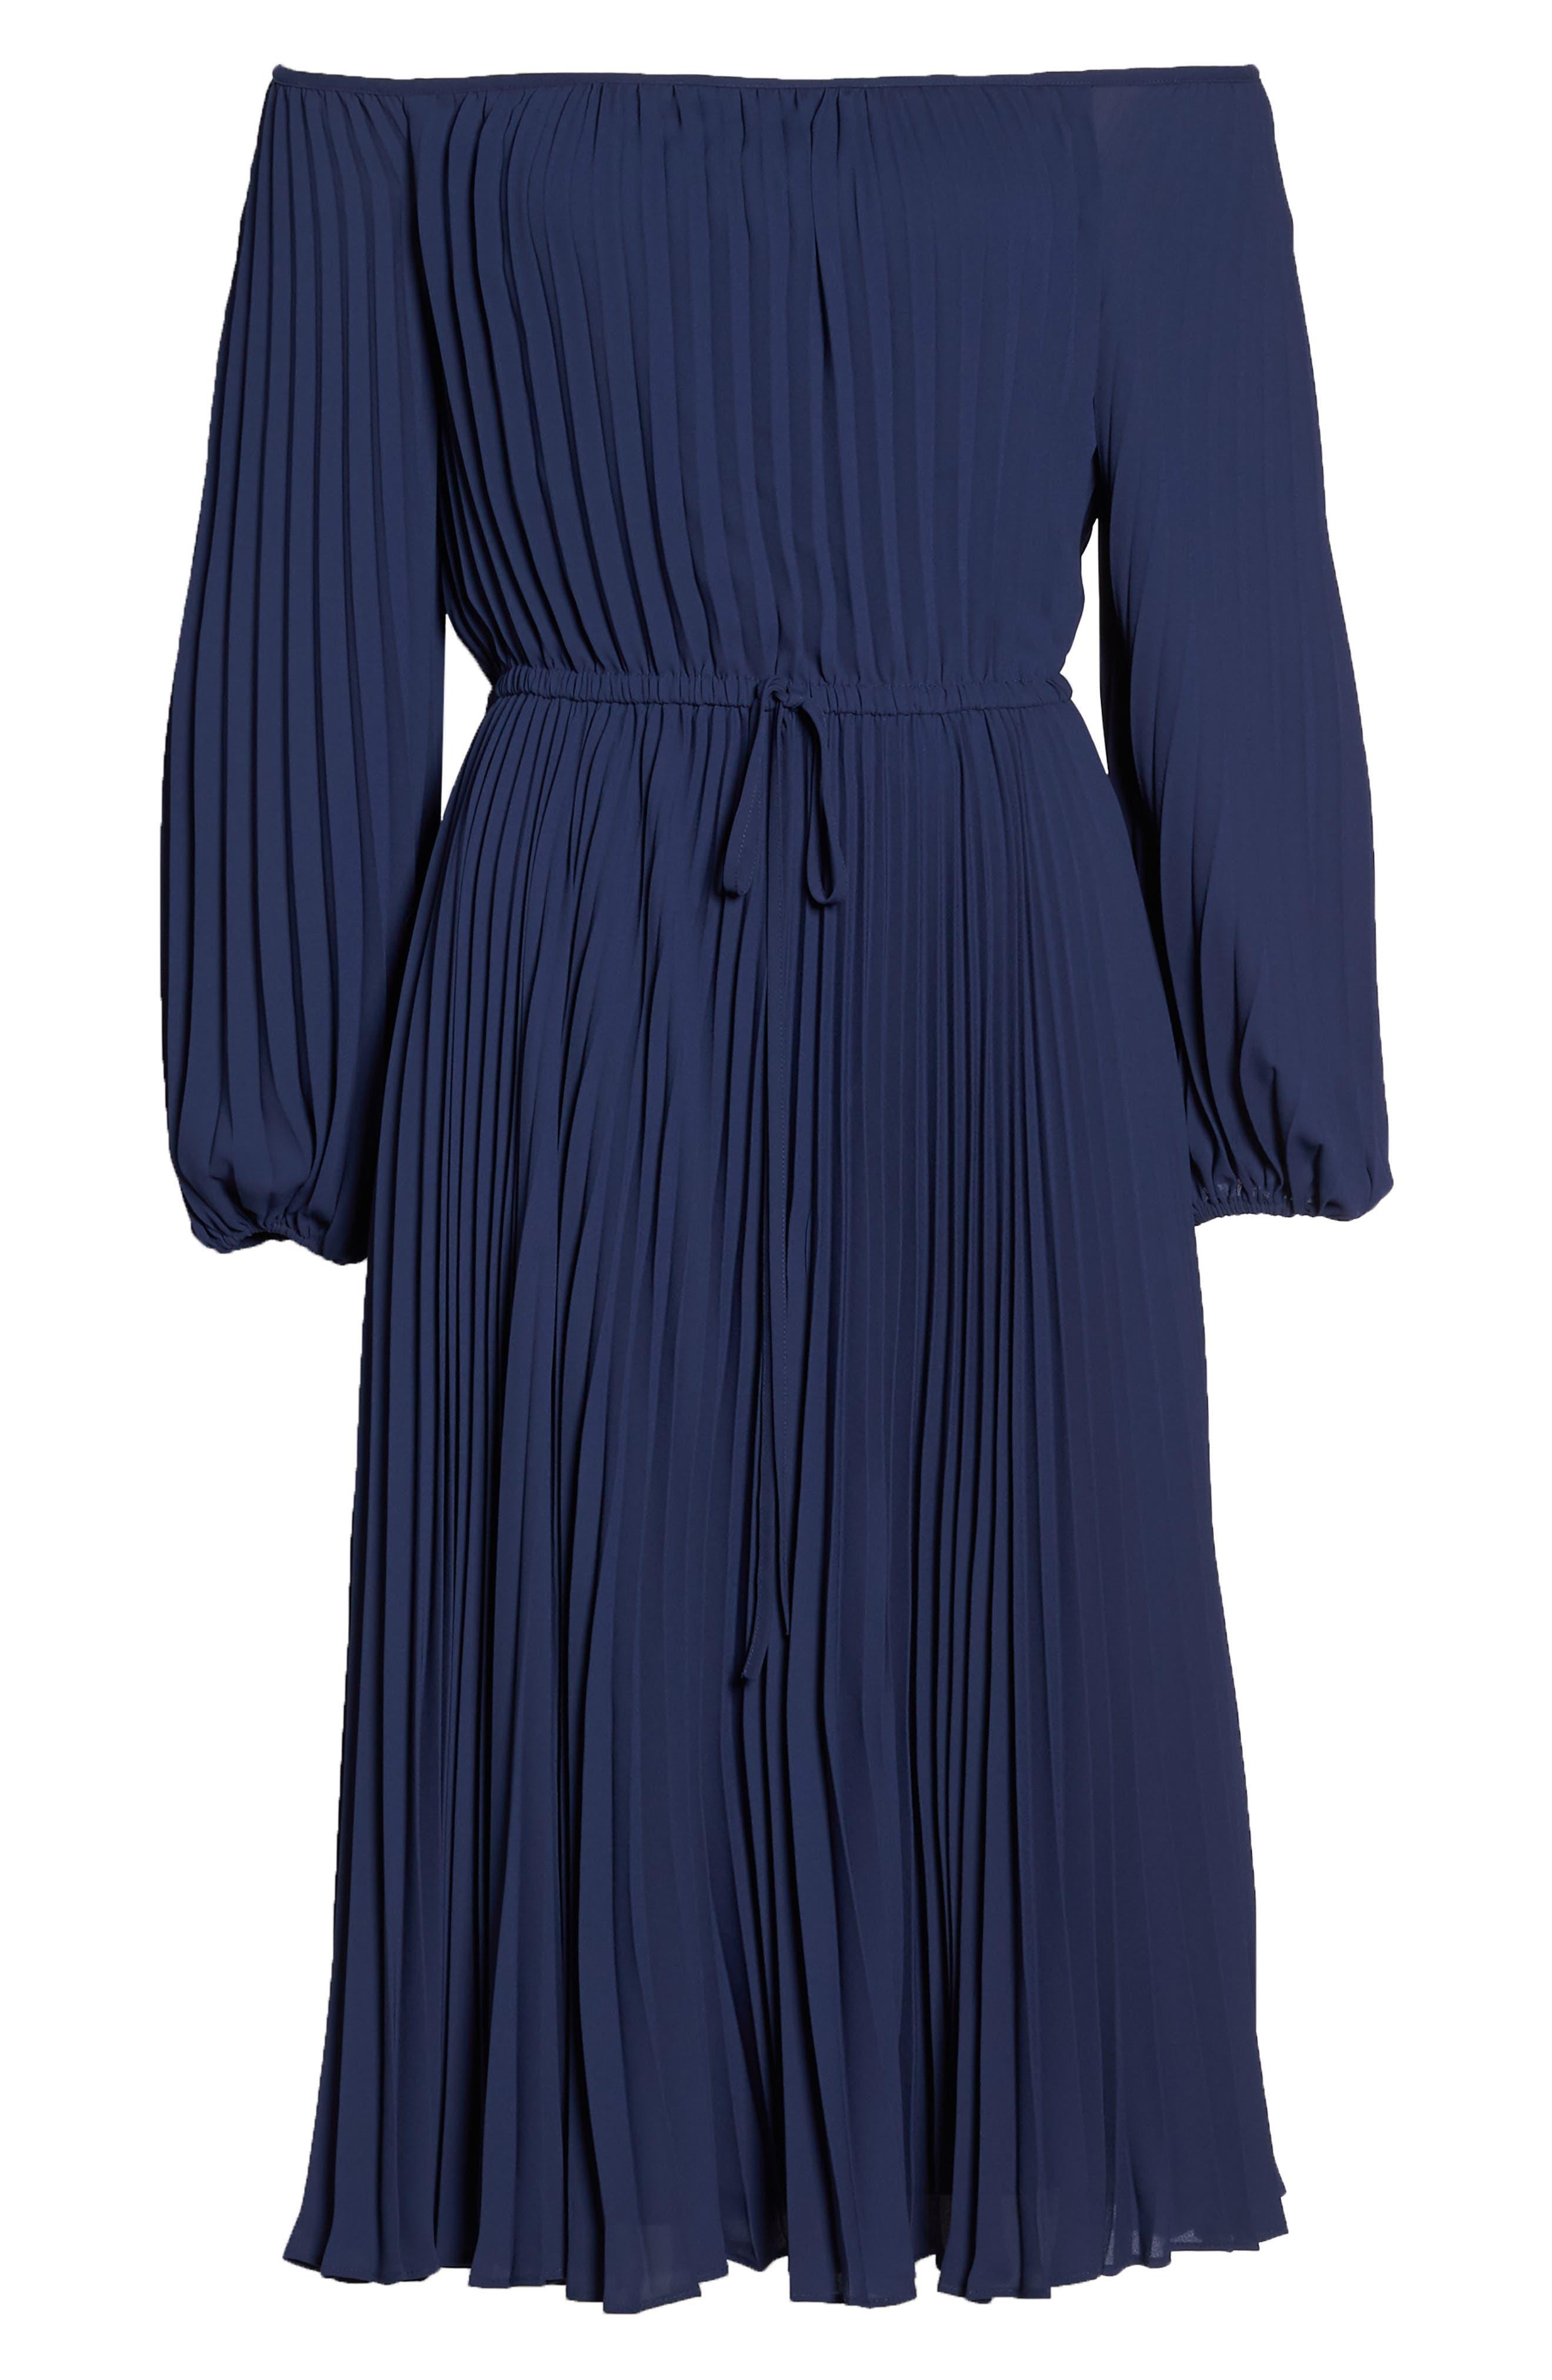 Elise Off the Shoulder Pleated Georgette Dress,                             Alternate thumbnail 7, color,                             462